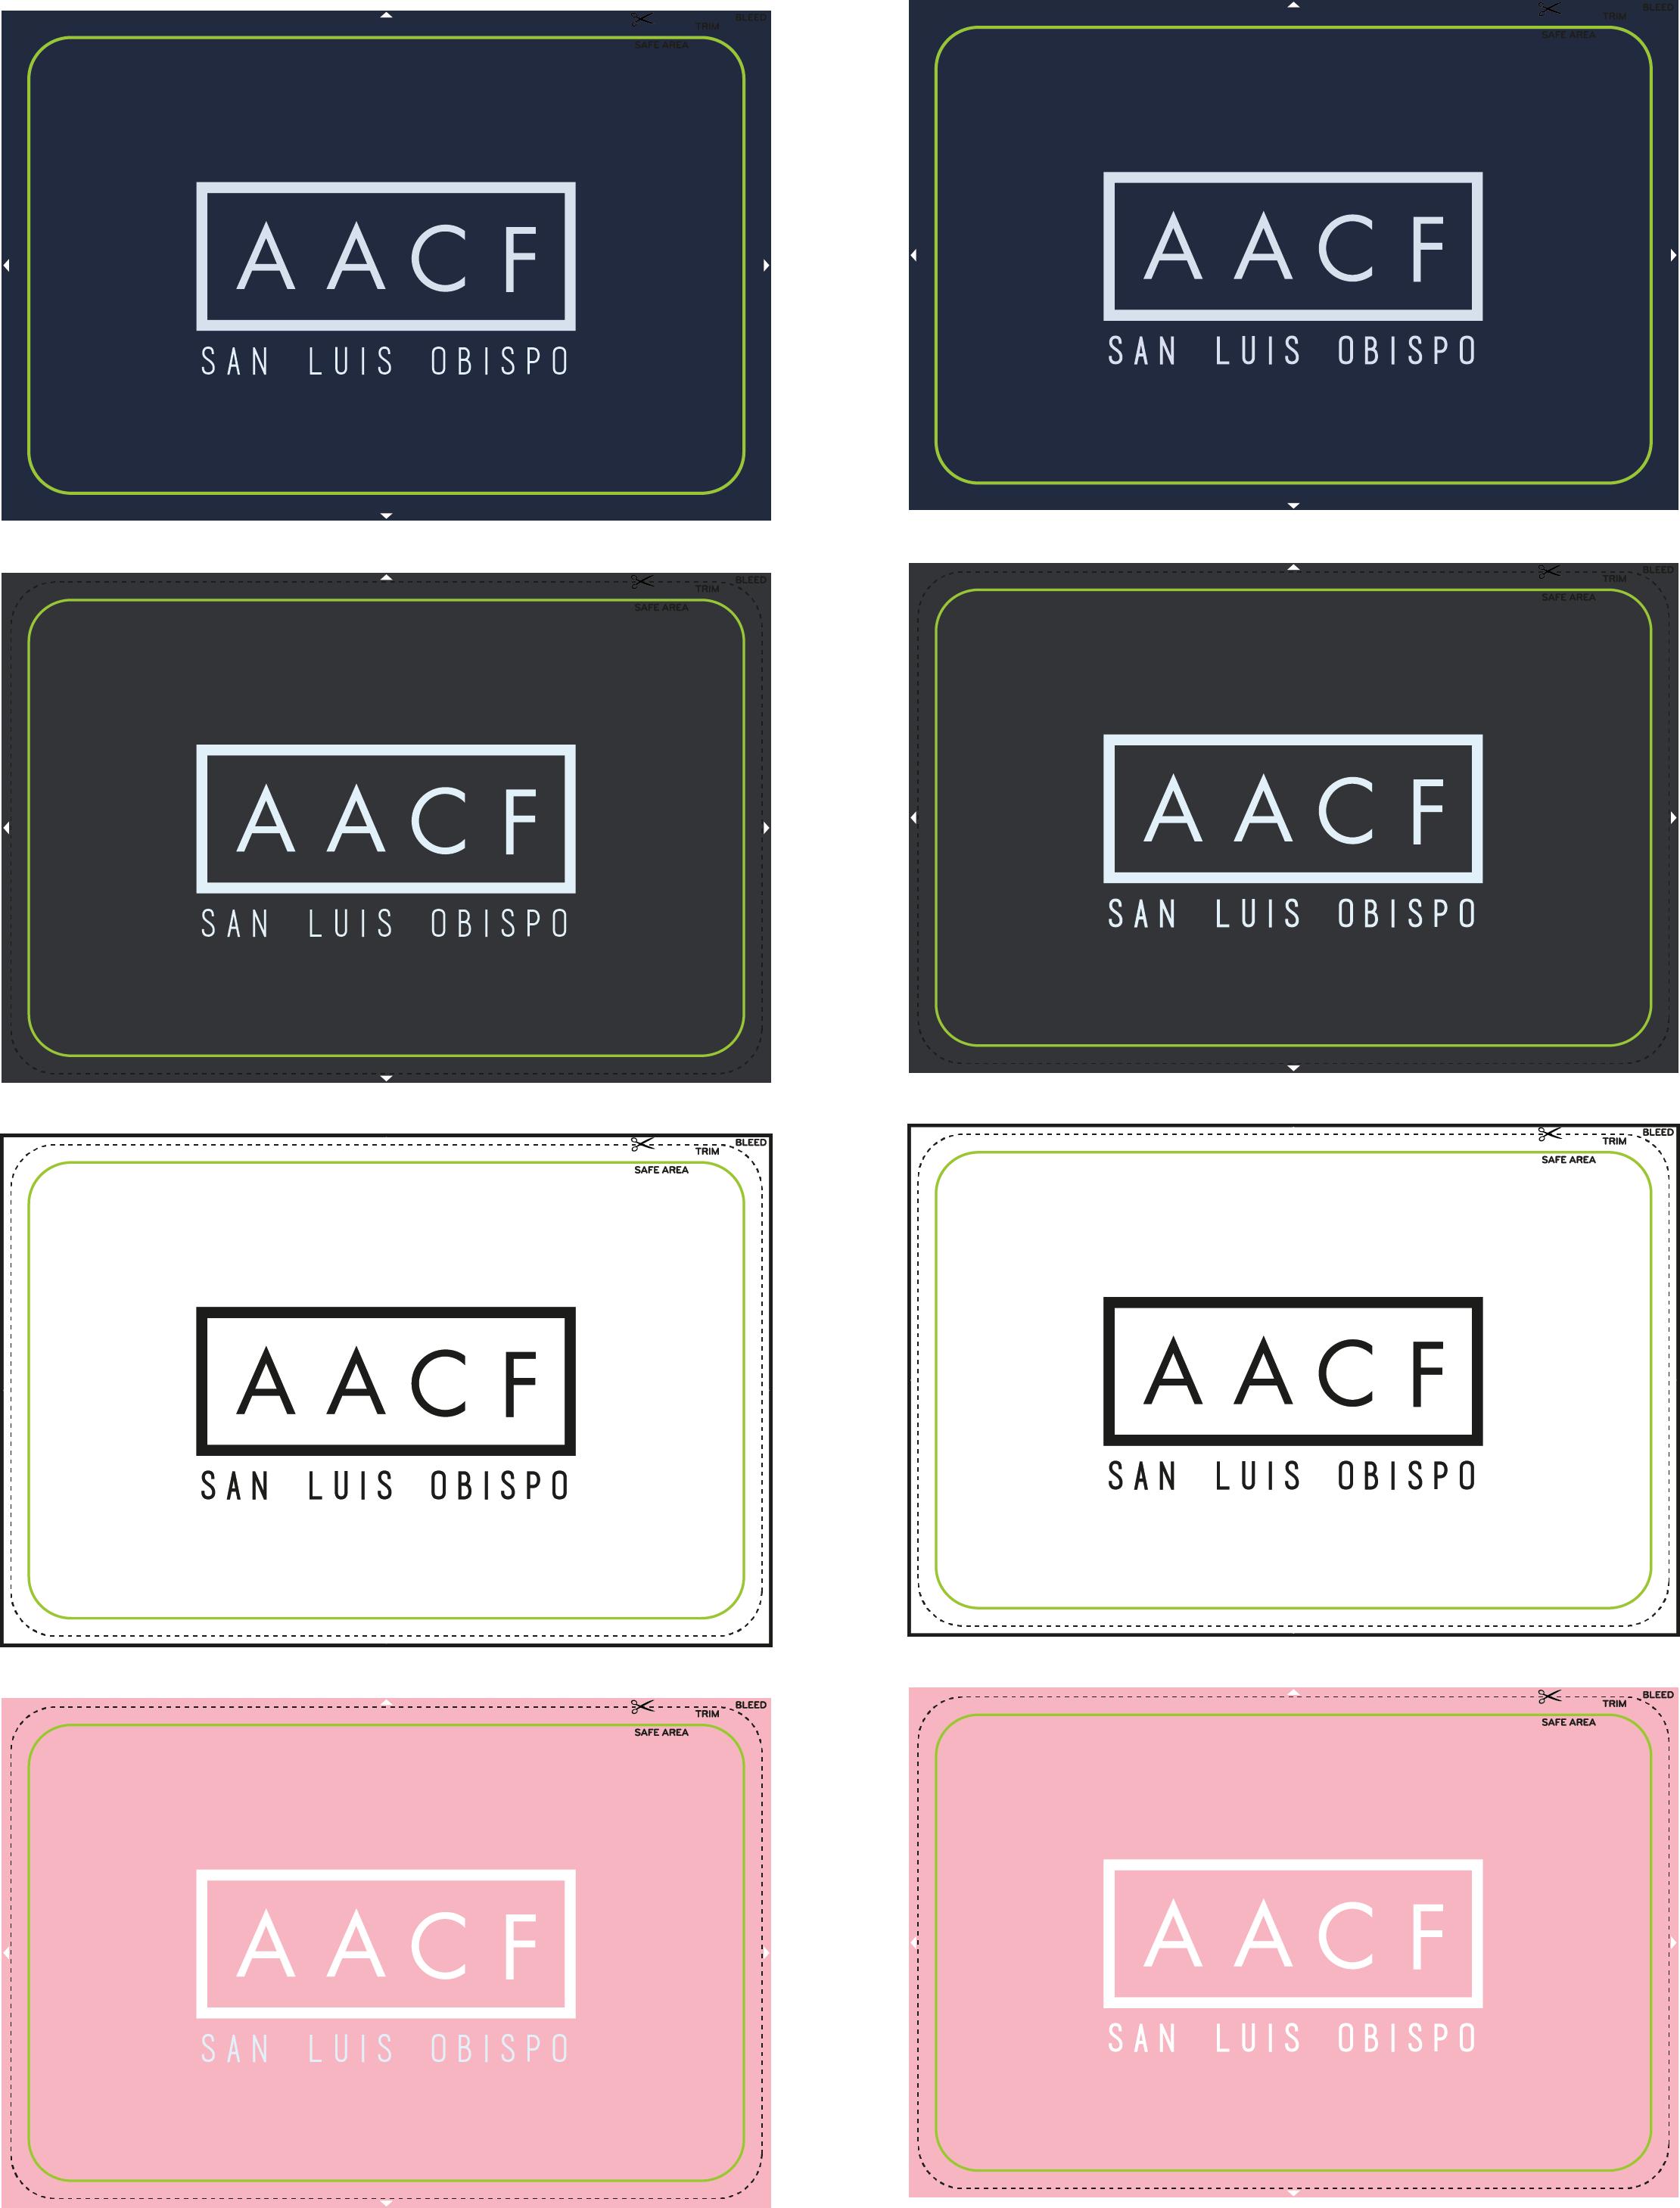 aacf_sticker_SLO_sizes.png